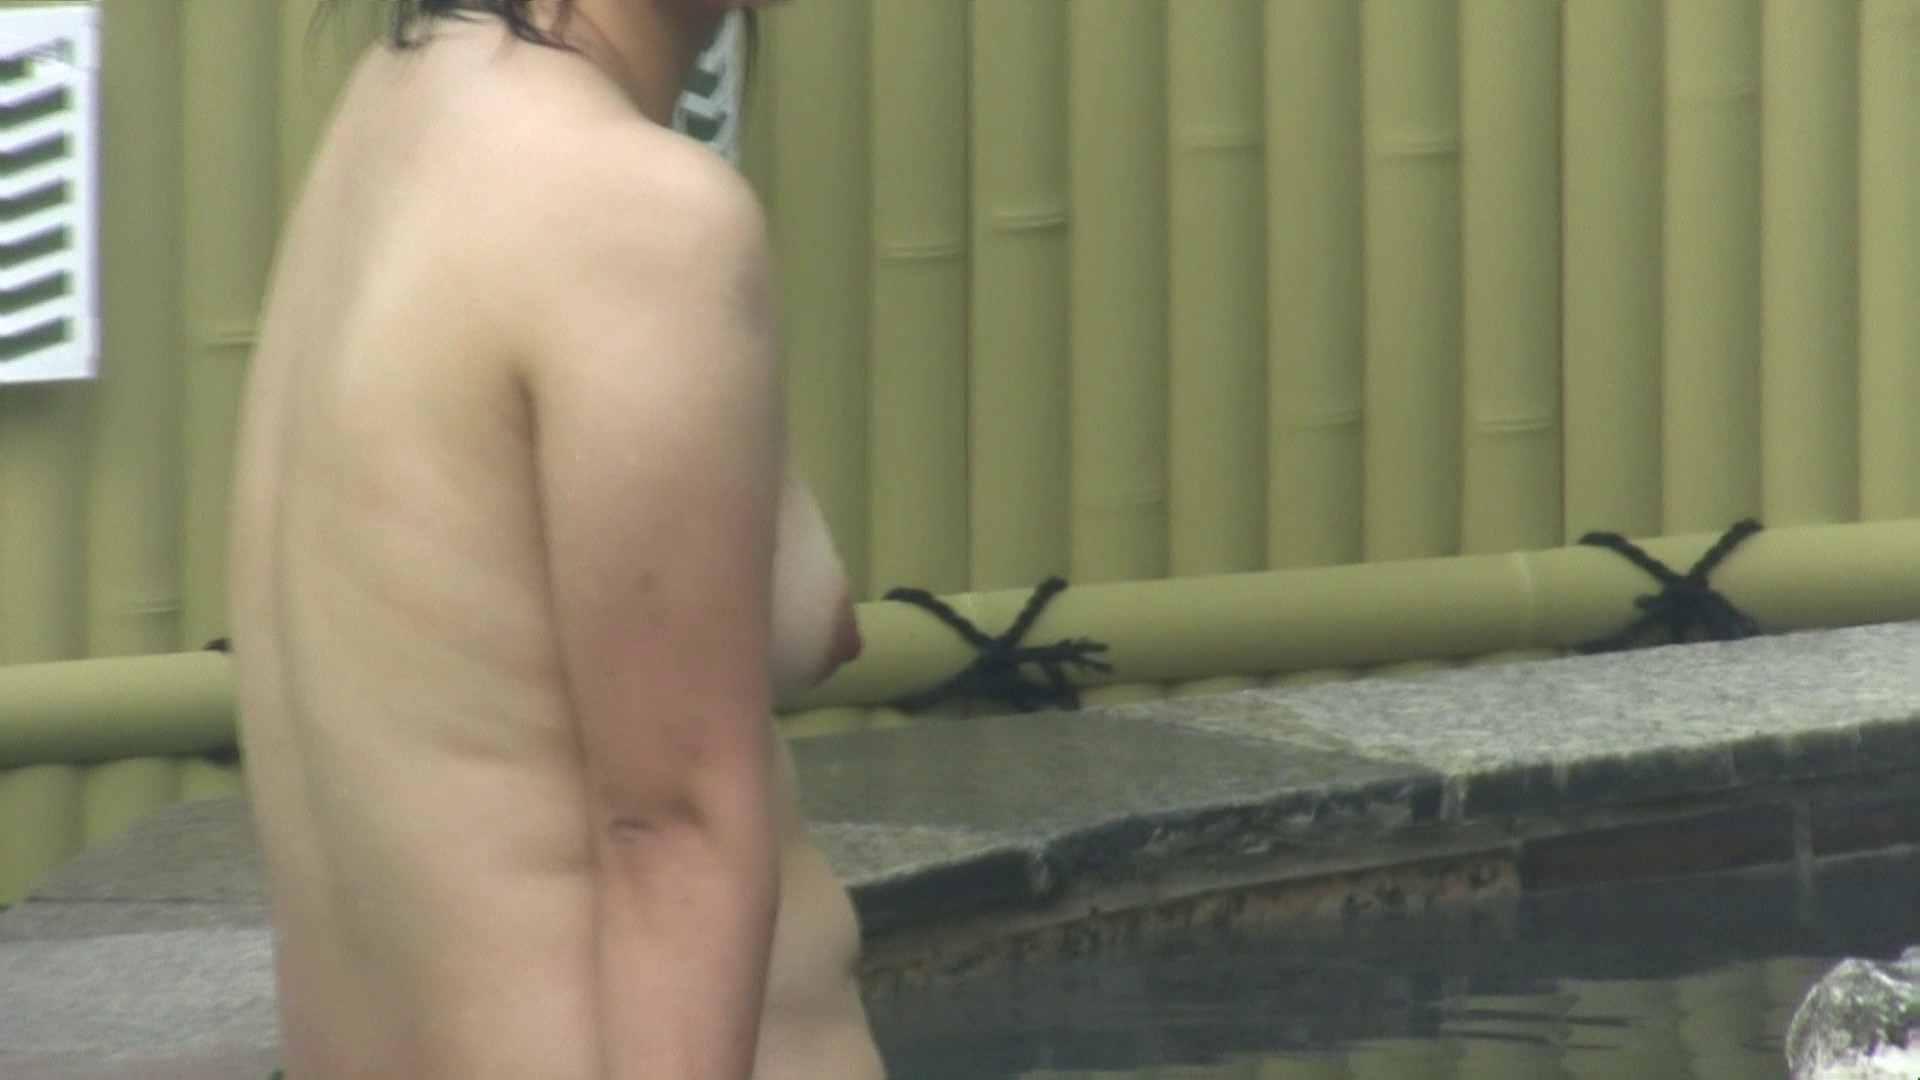 Aquaな露天風呂Vol.604 OLのエロ生活 オメコ動画キャプチャ 84連発 44